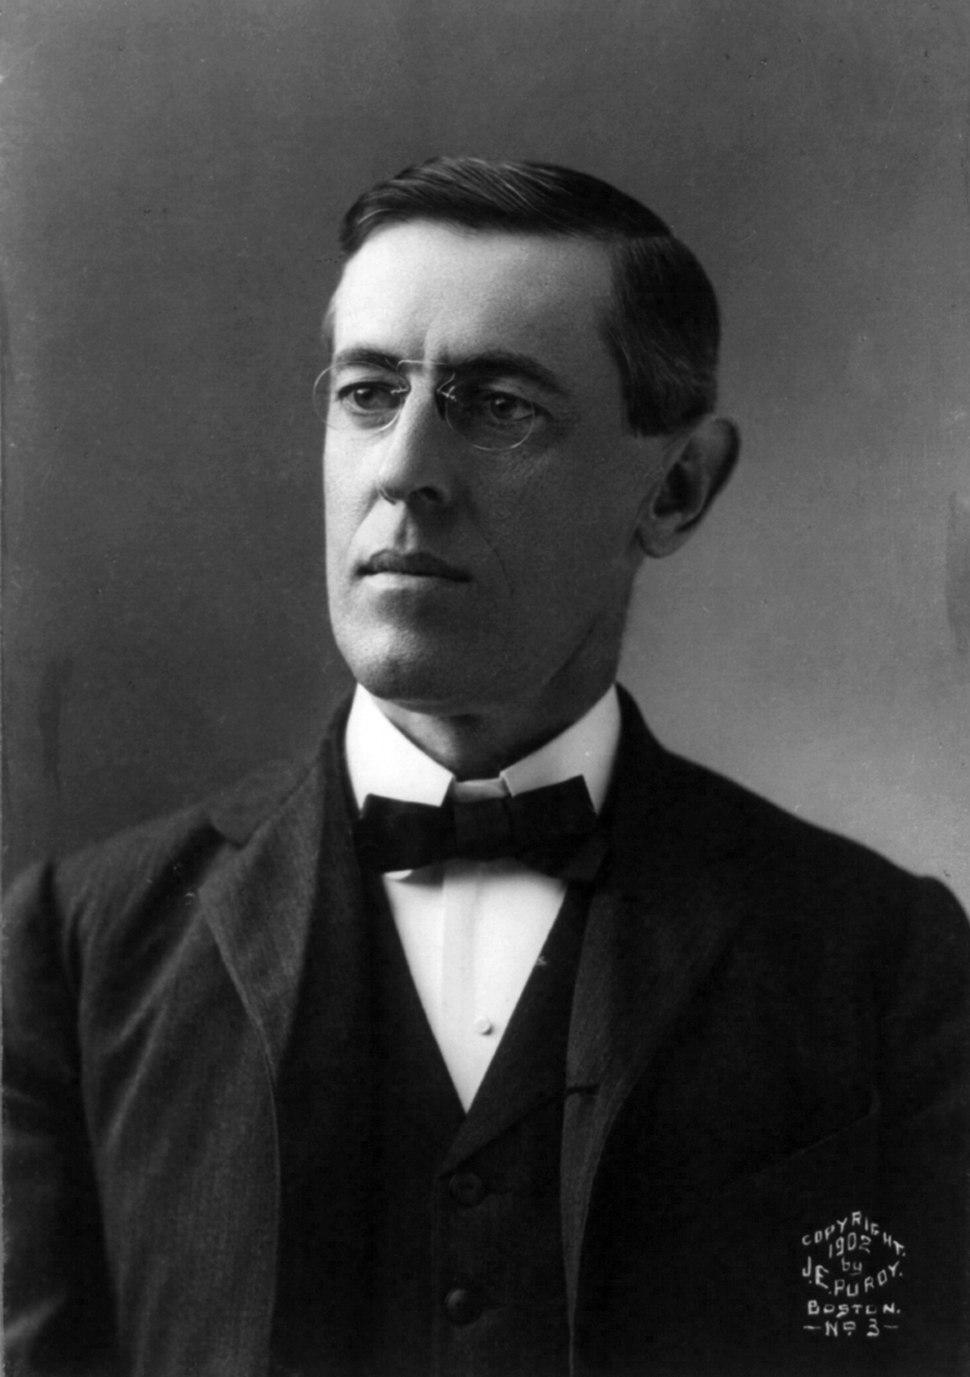 Woodrow Wilson 1902 cph.3b11773